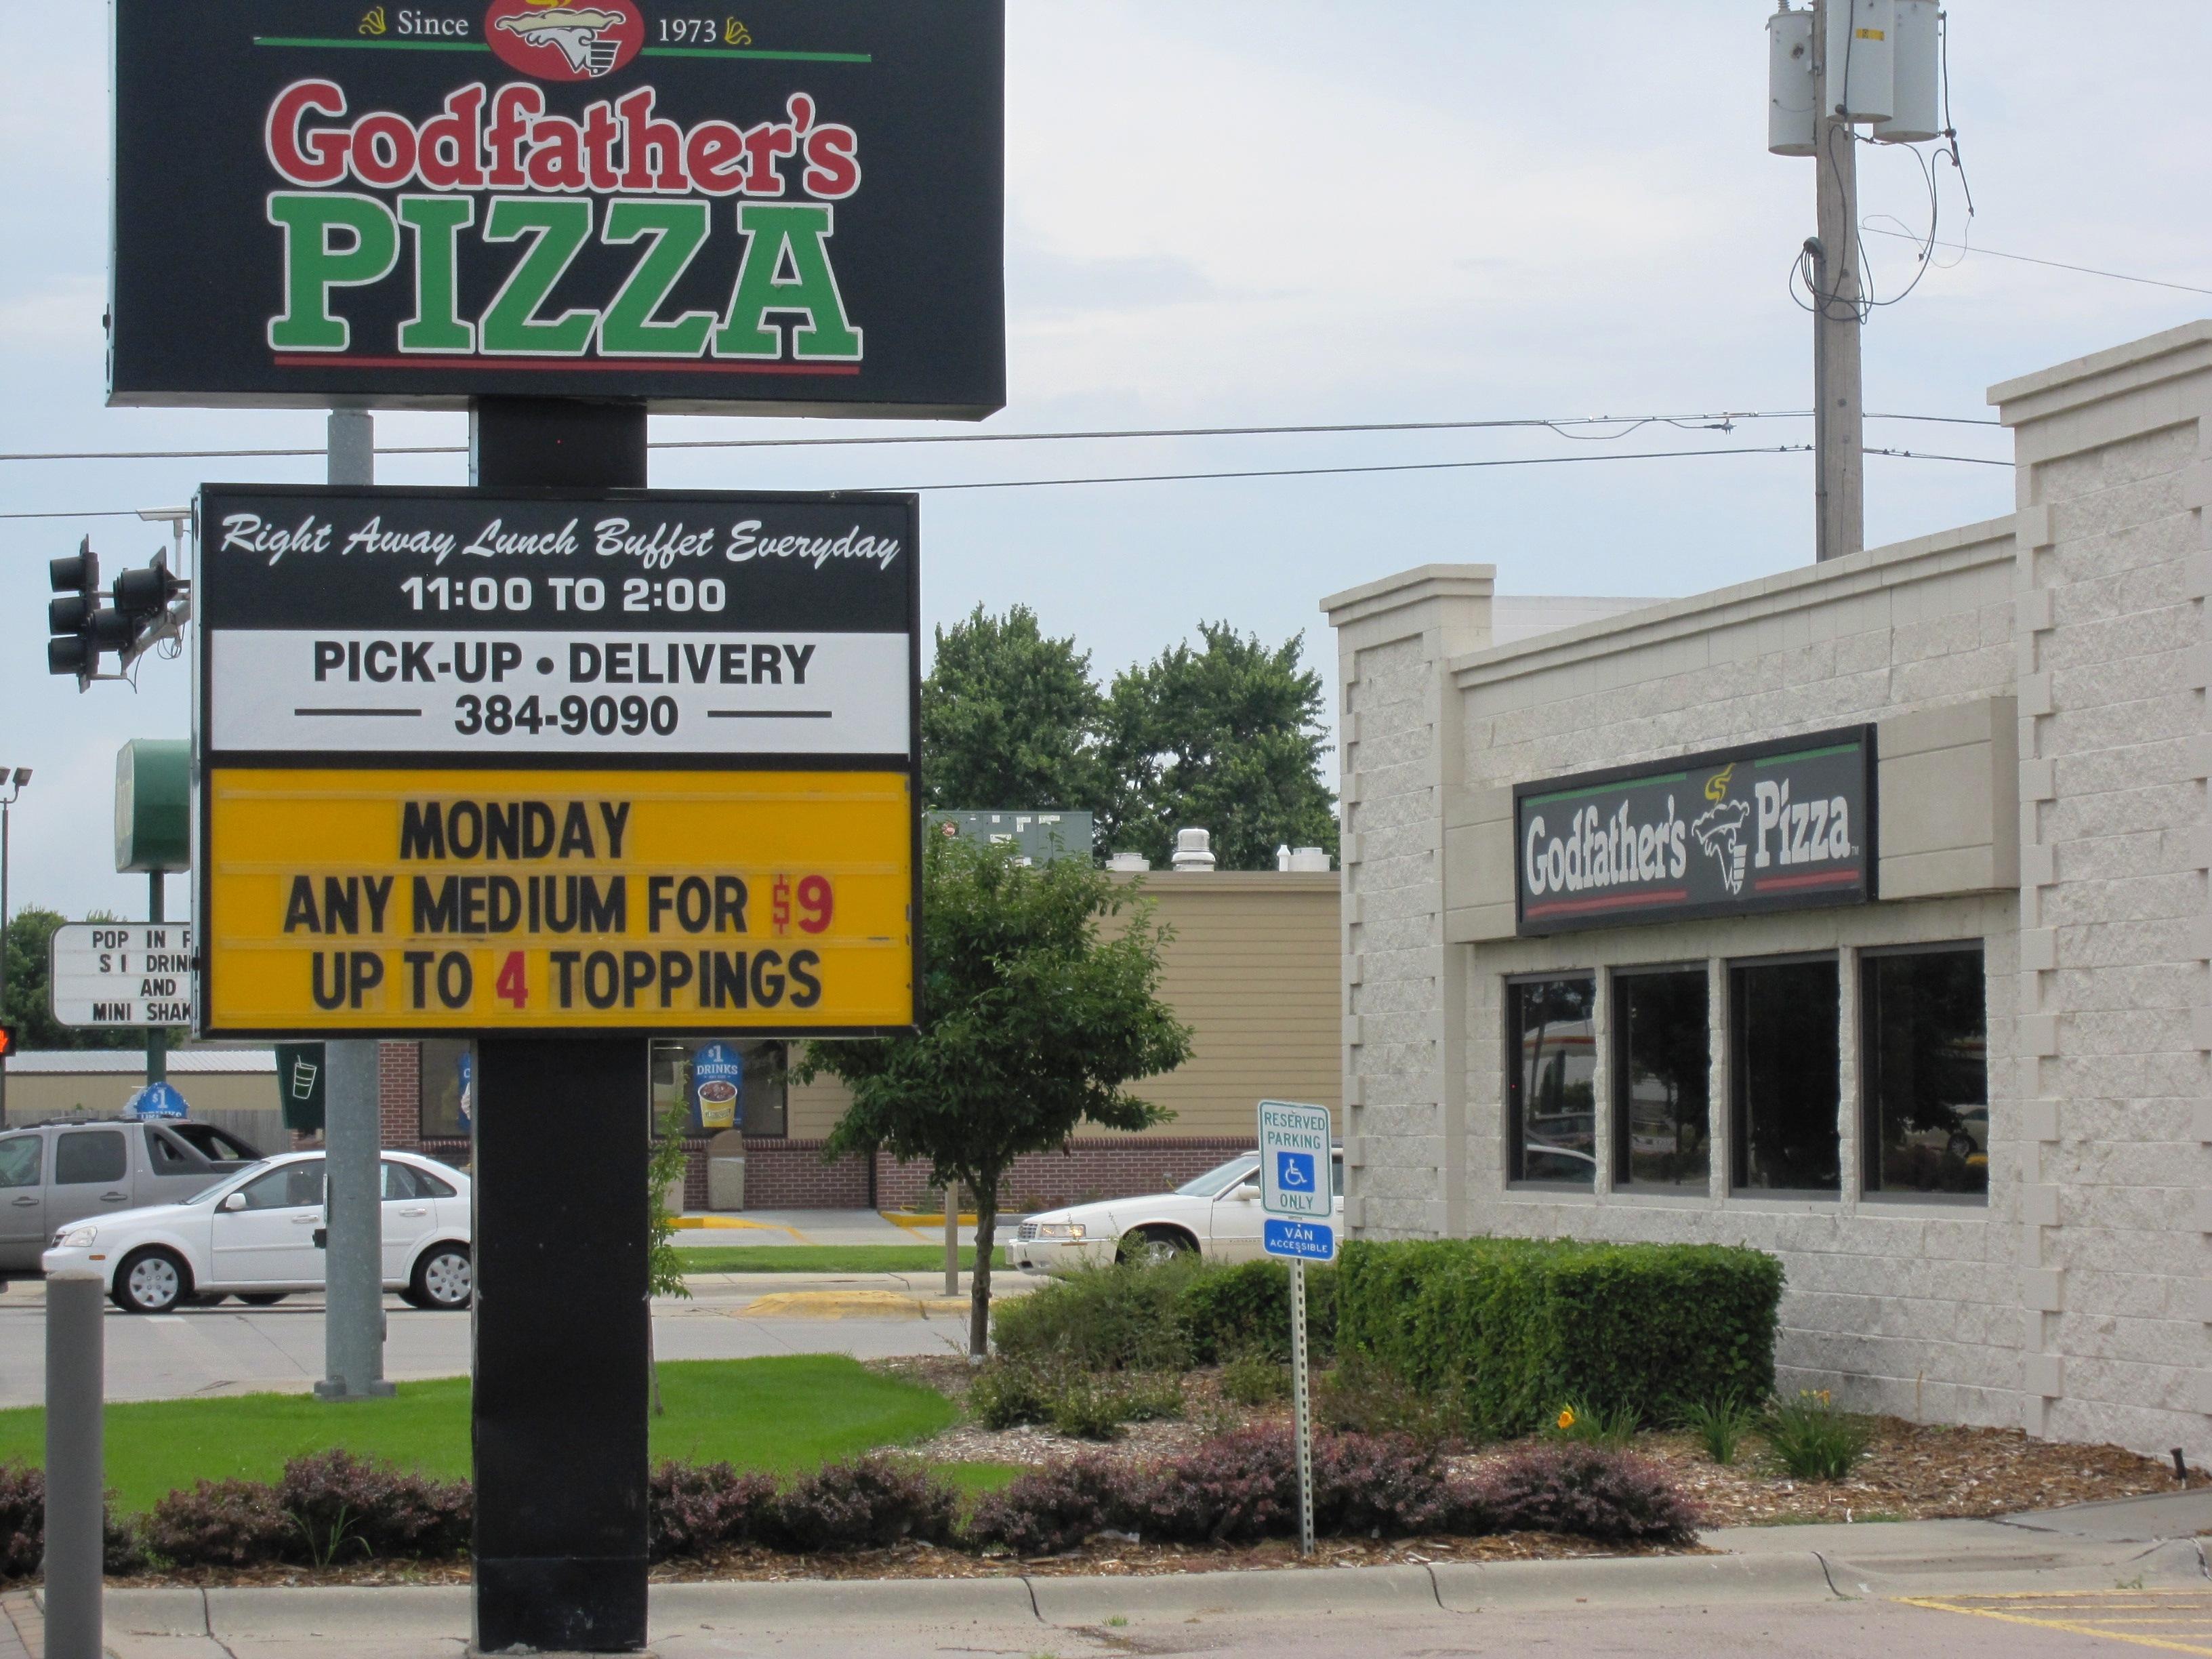 Godfathers Pizza of Grand Island, Ne. image 8